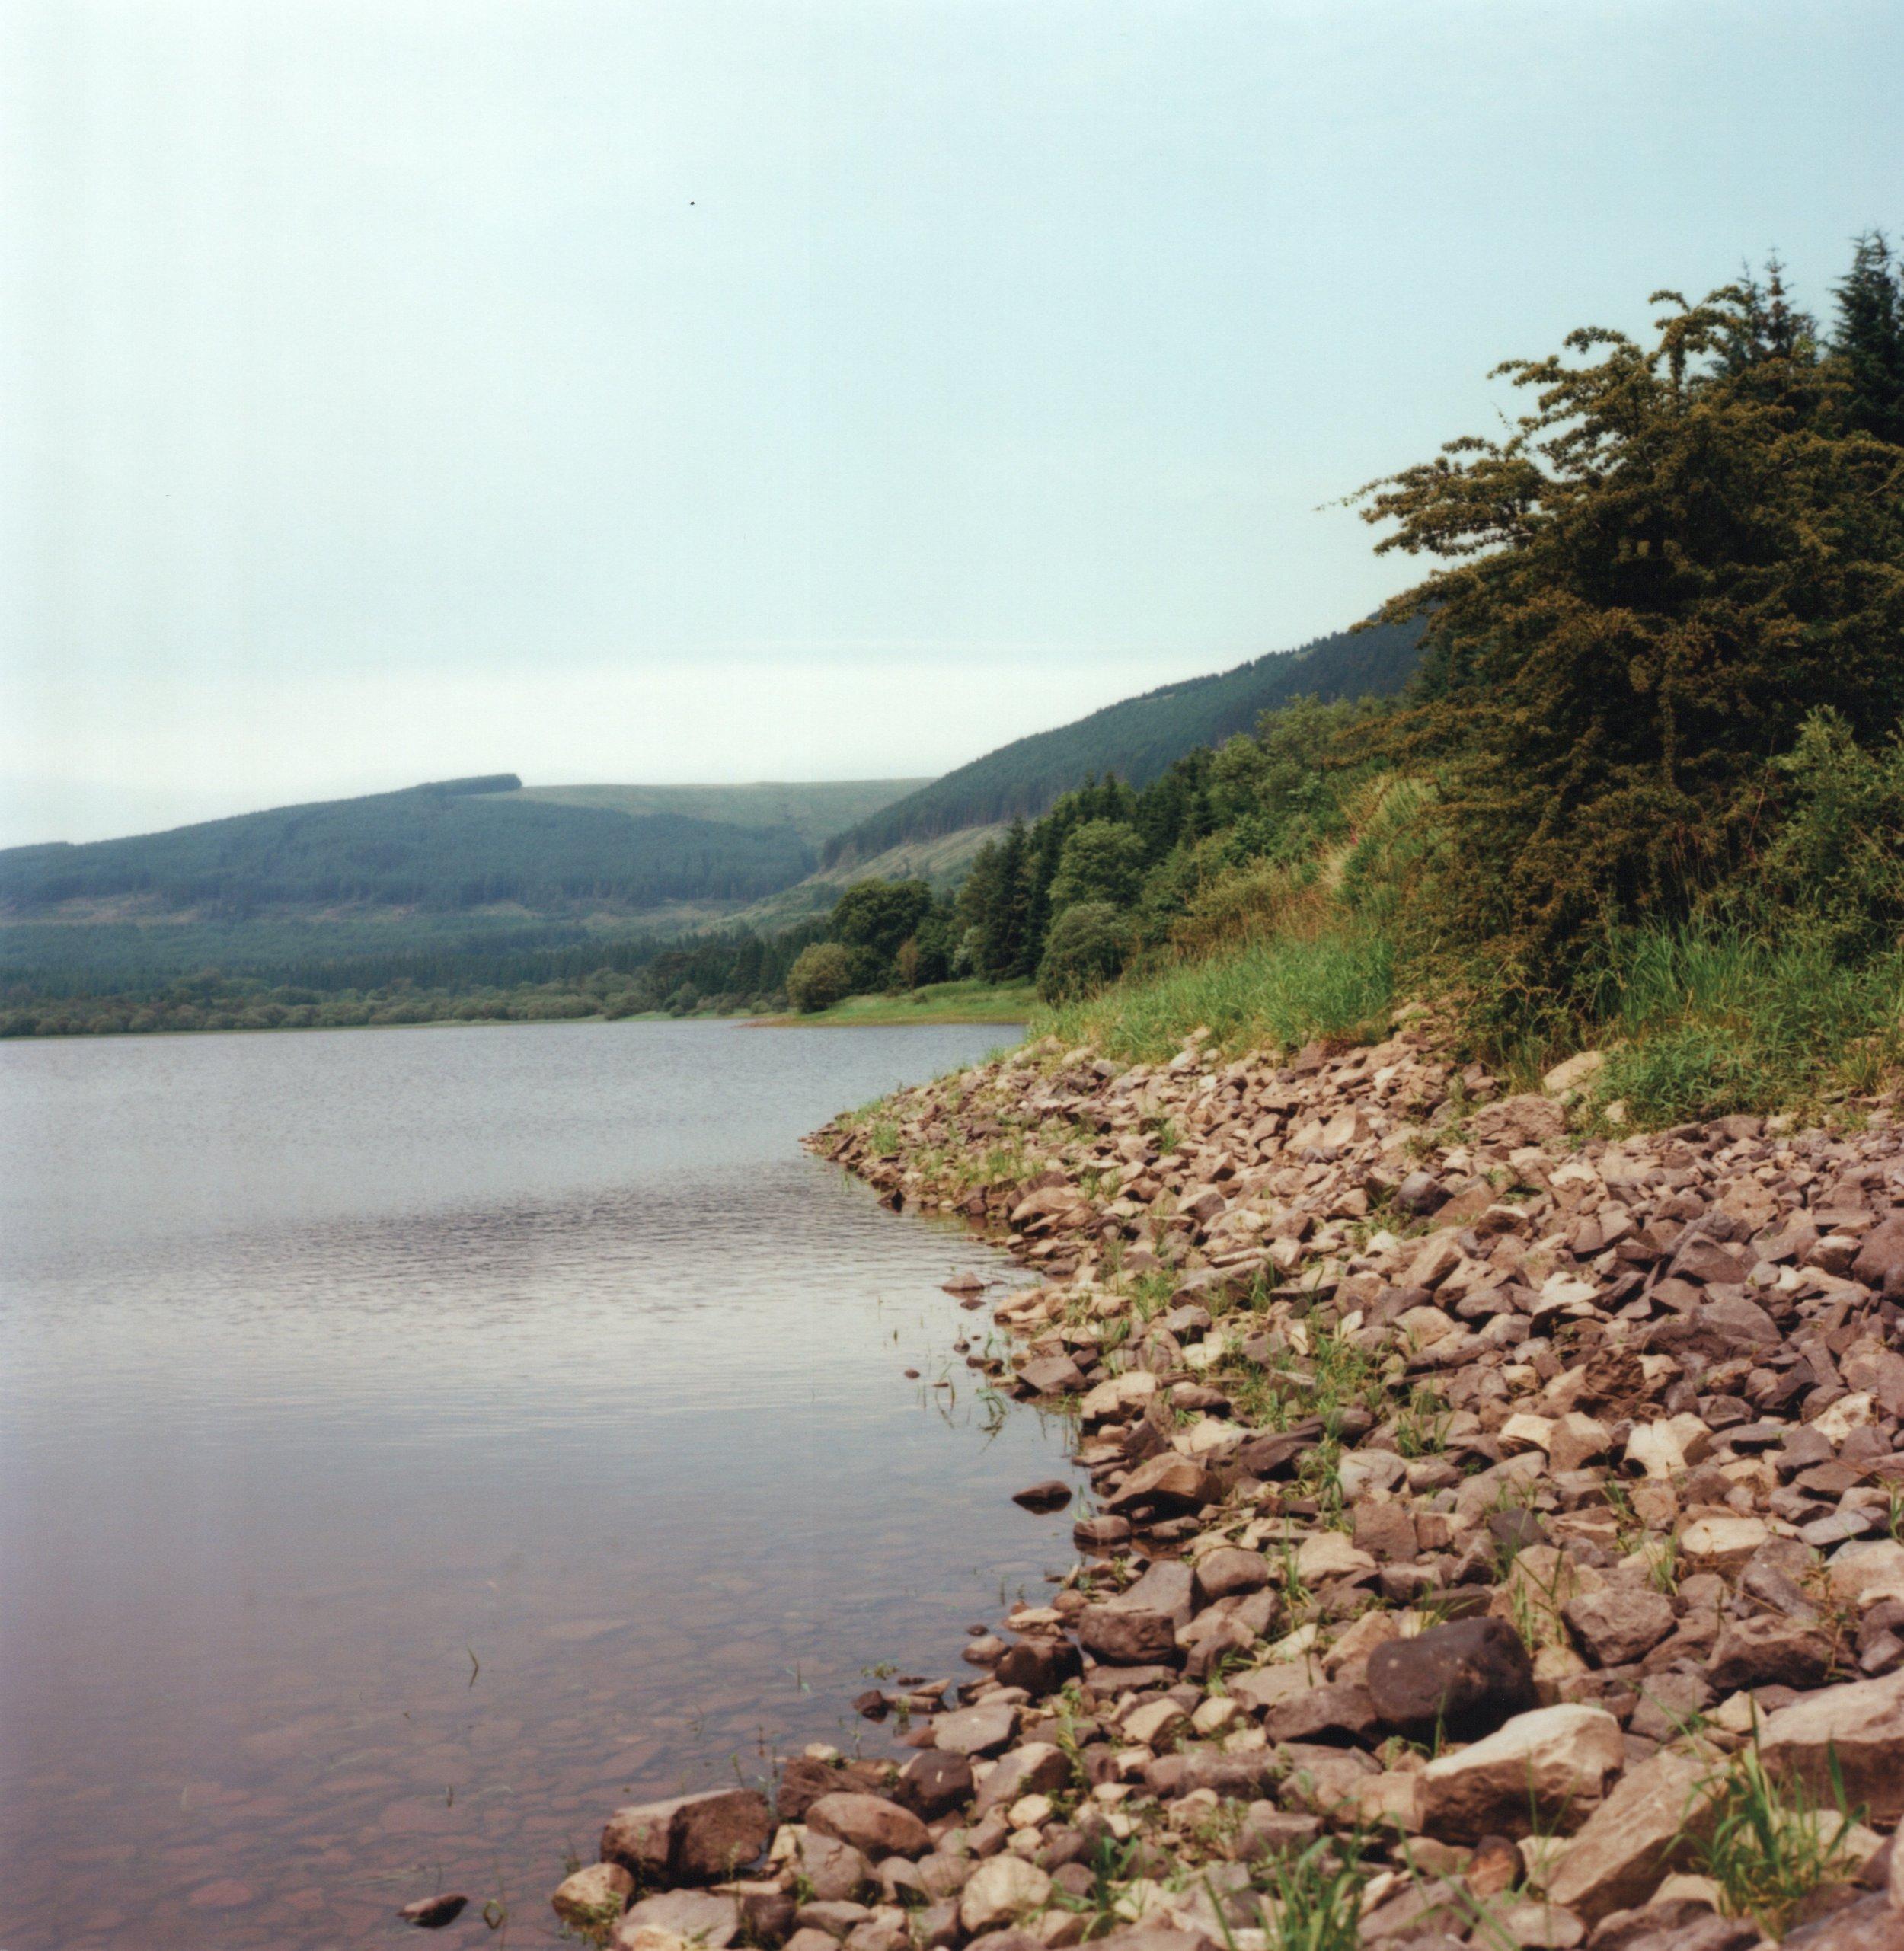 Pontsticill Reservoir. Zenza Bronica S2A, Kodak Ektar 100.